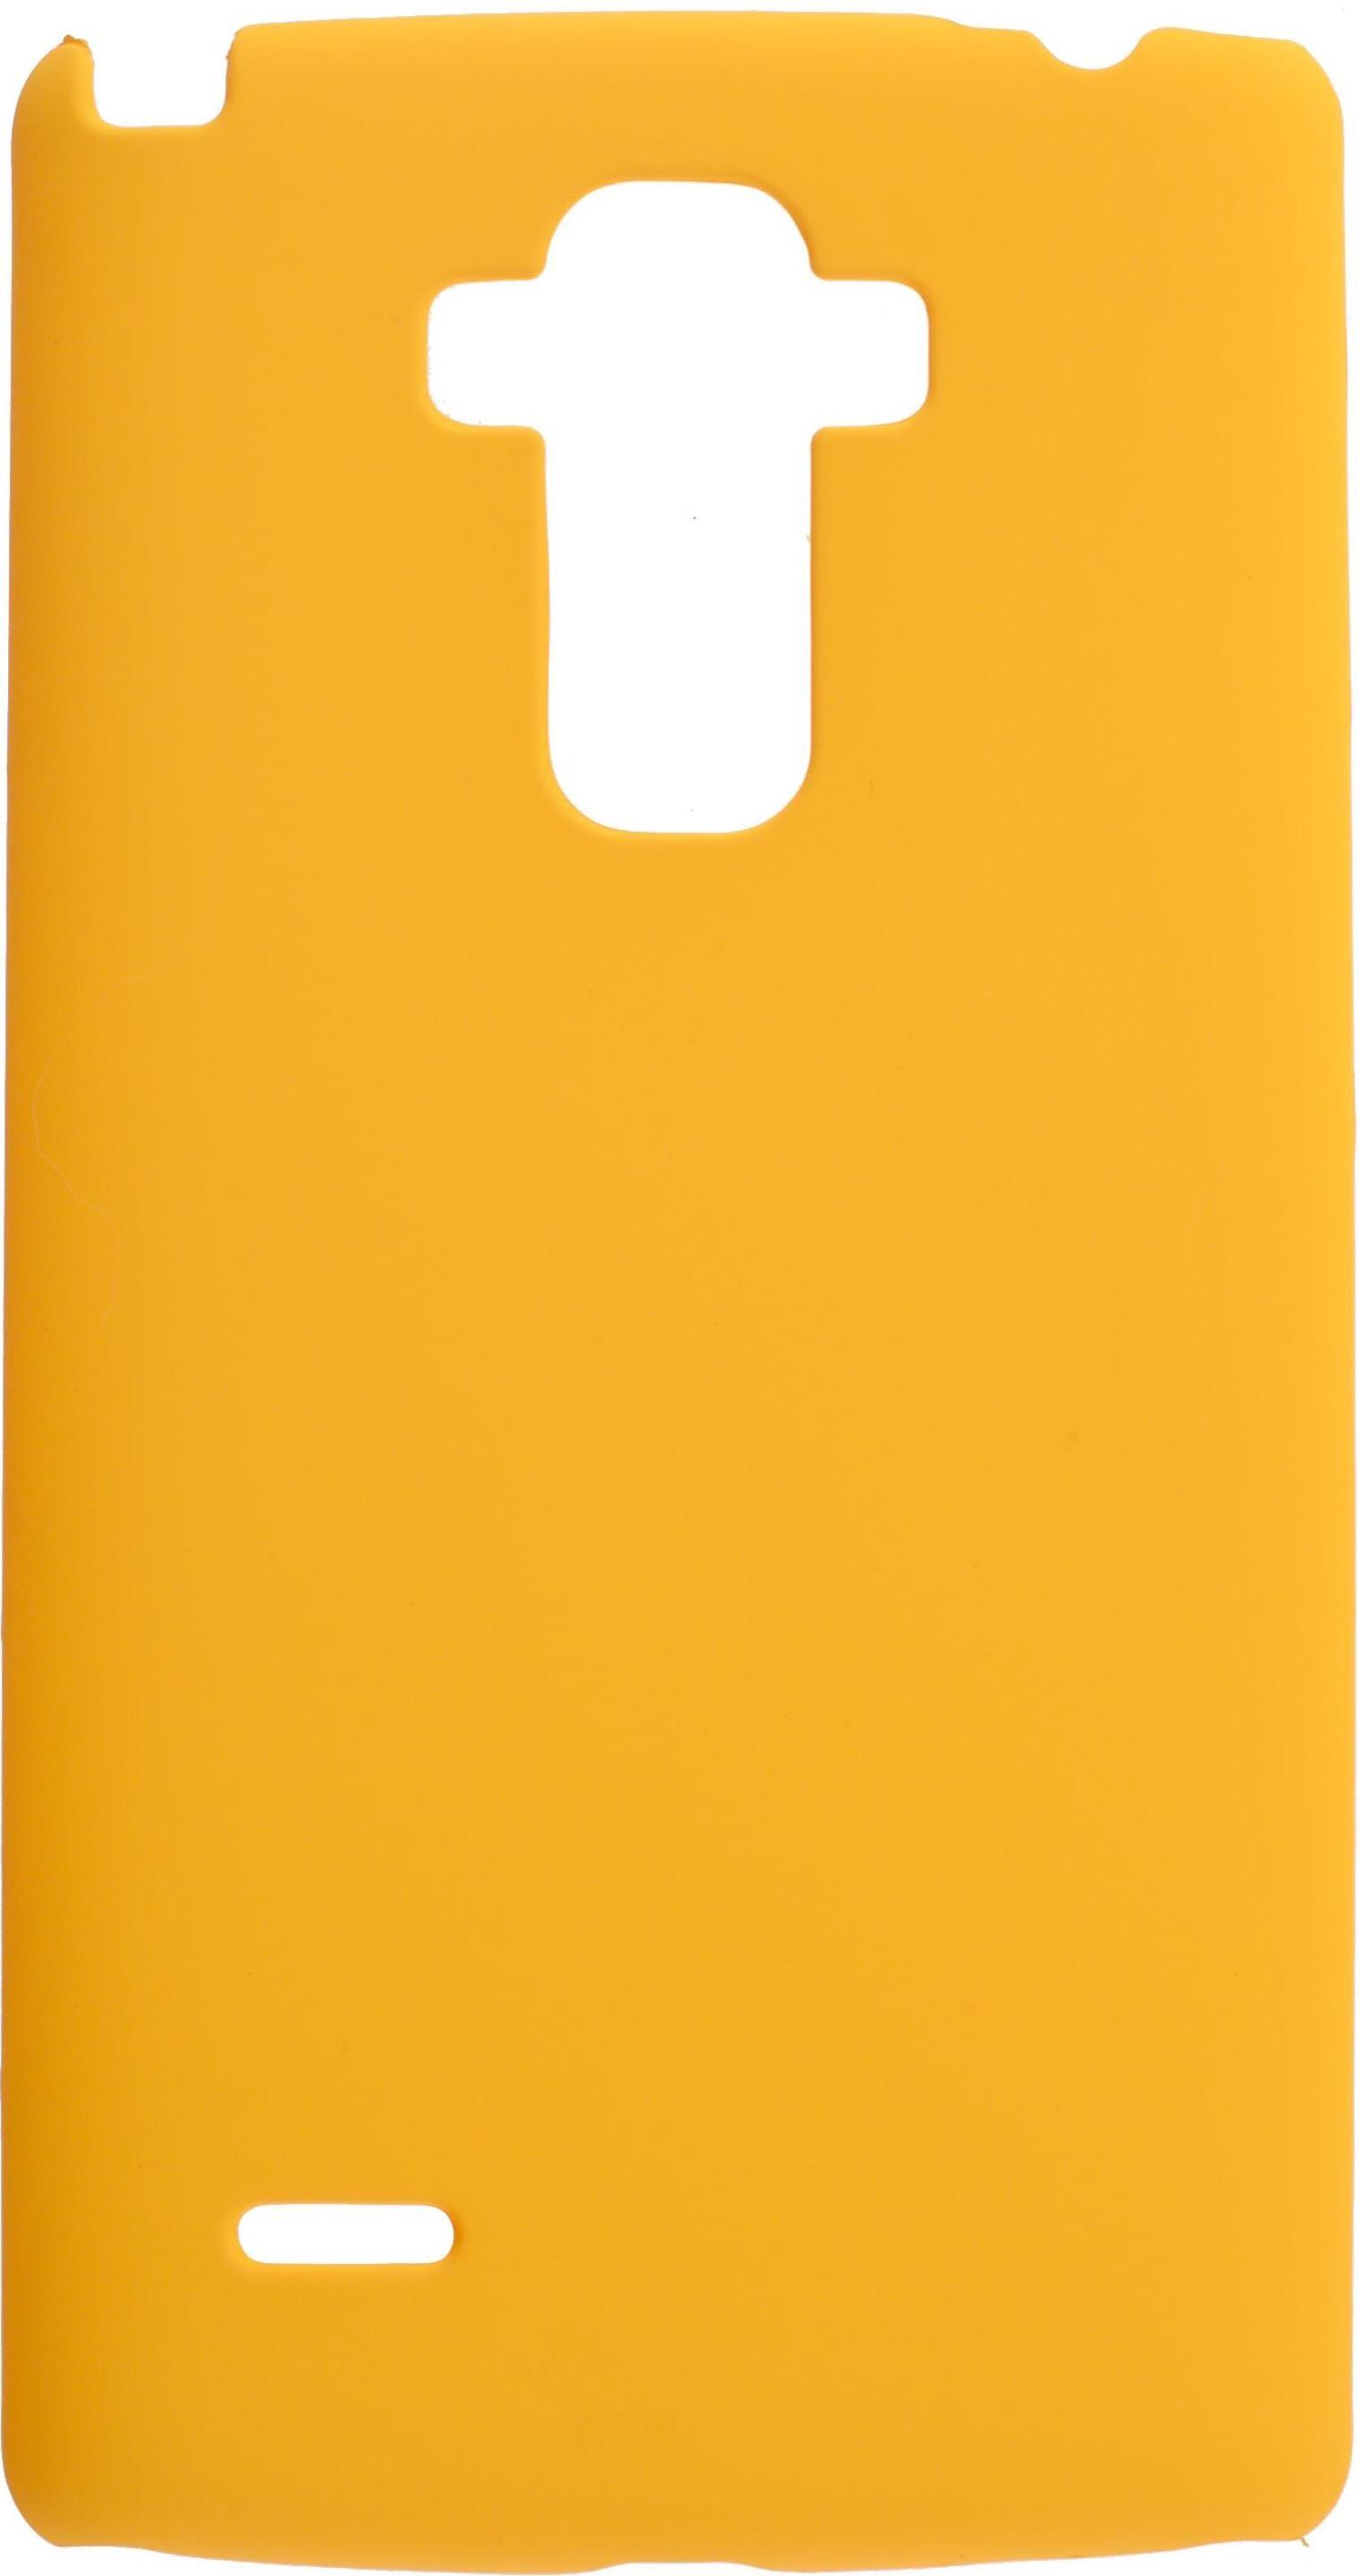 Накладка skinBOX для LG G4 Stylus, 2000000080611, желтый накладка skinbox для lg g4s 2000000079226 черный